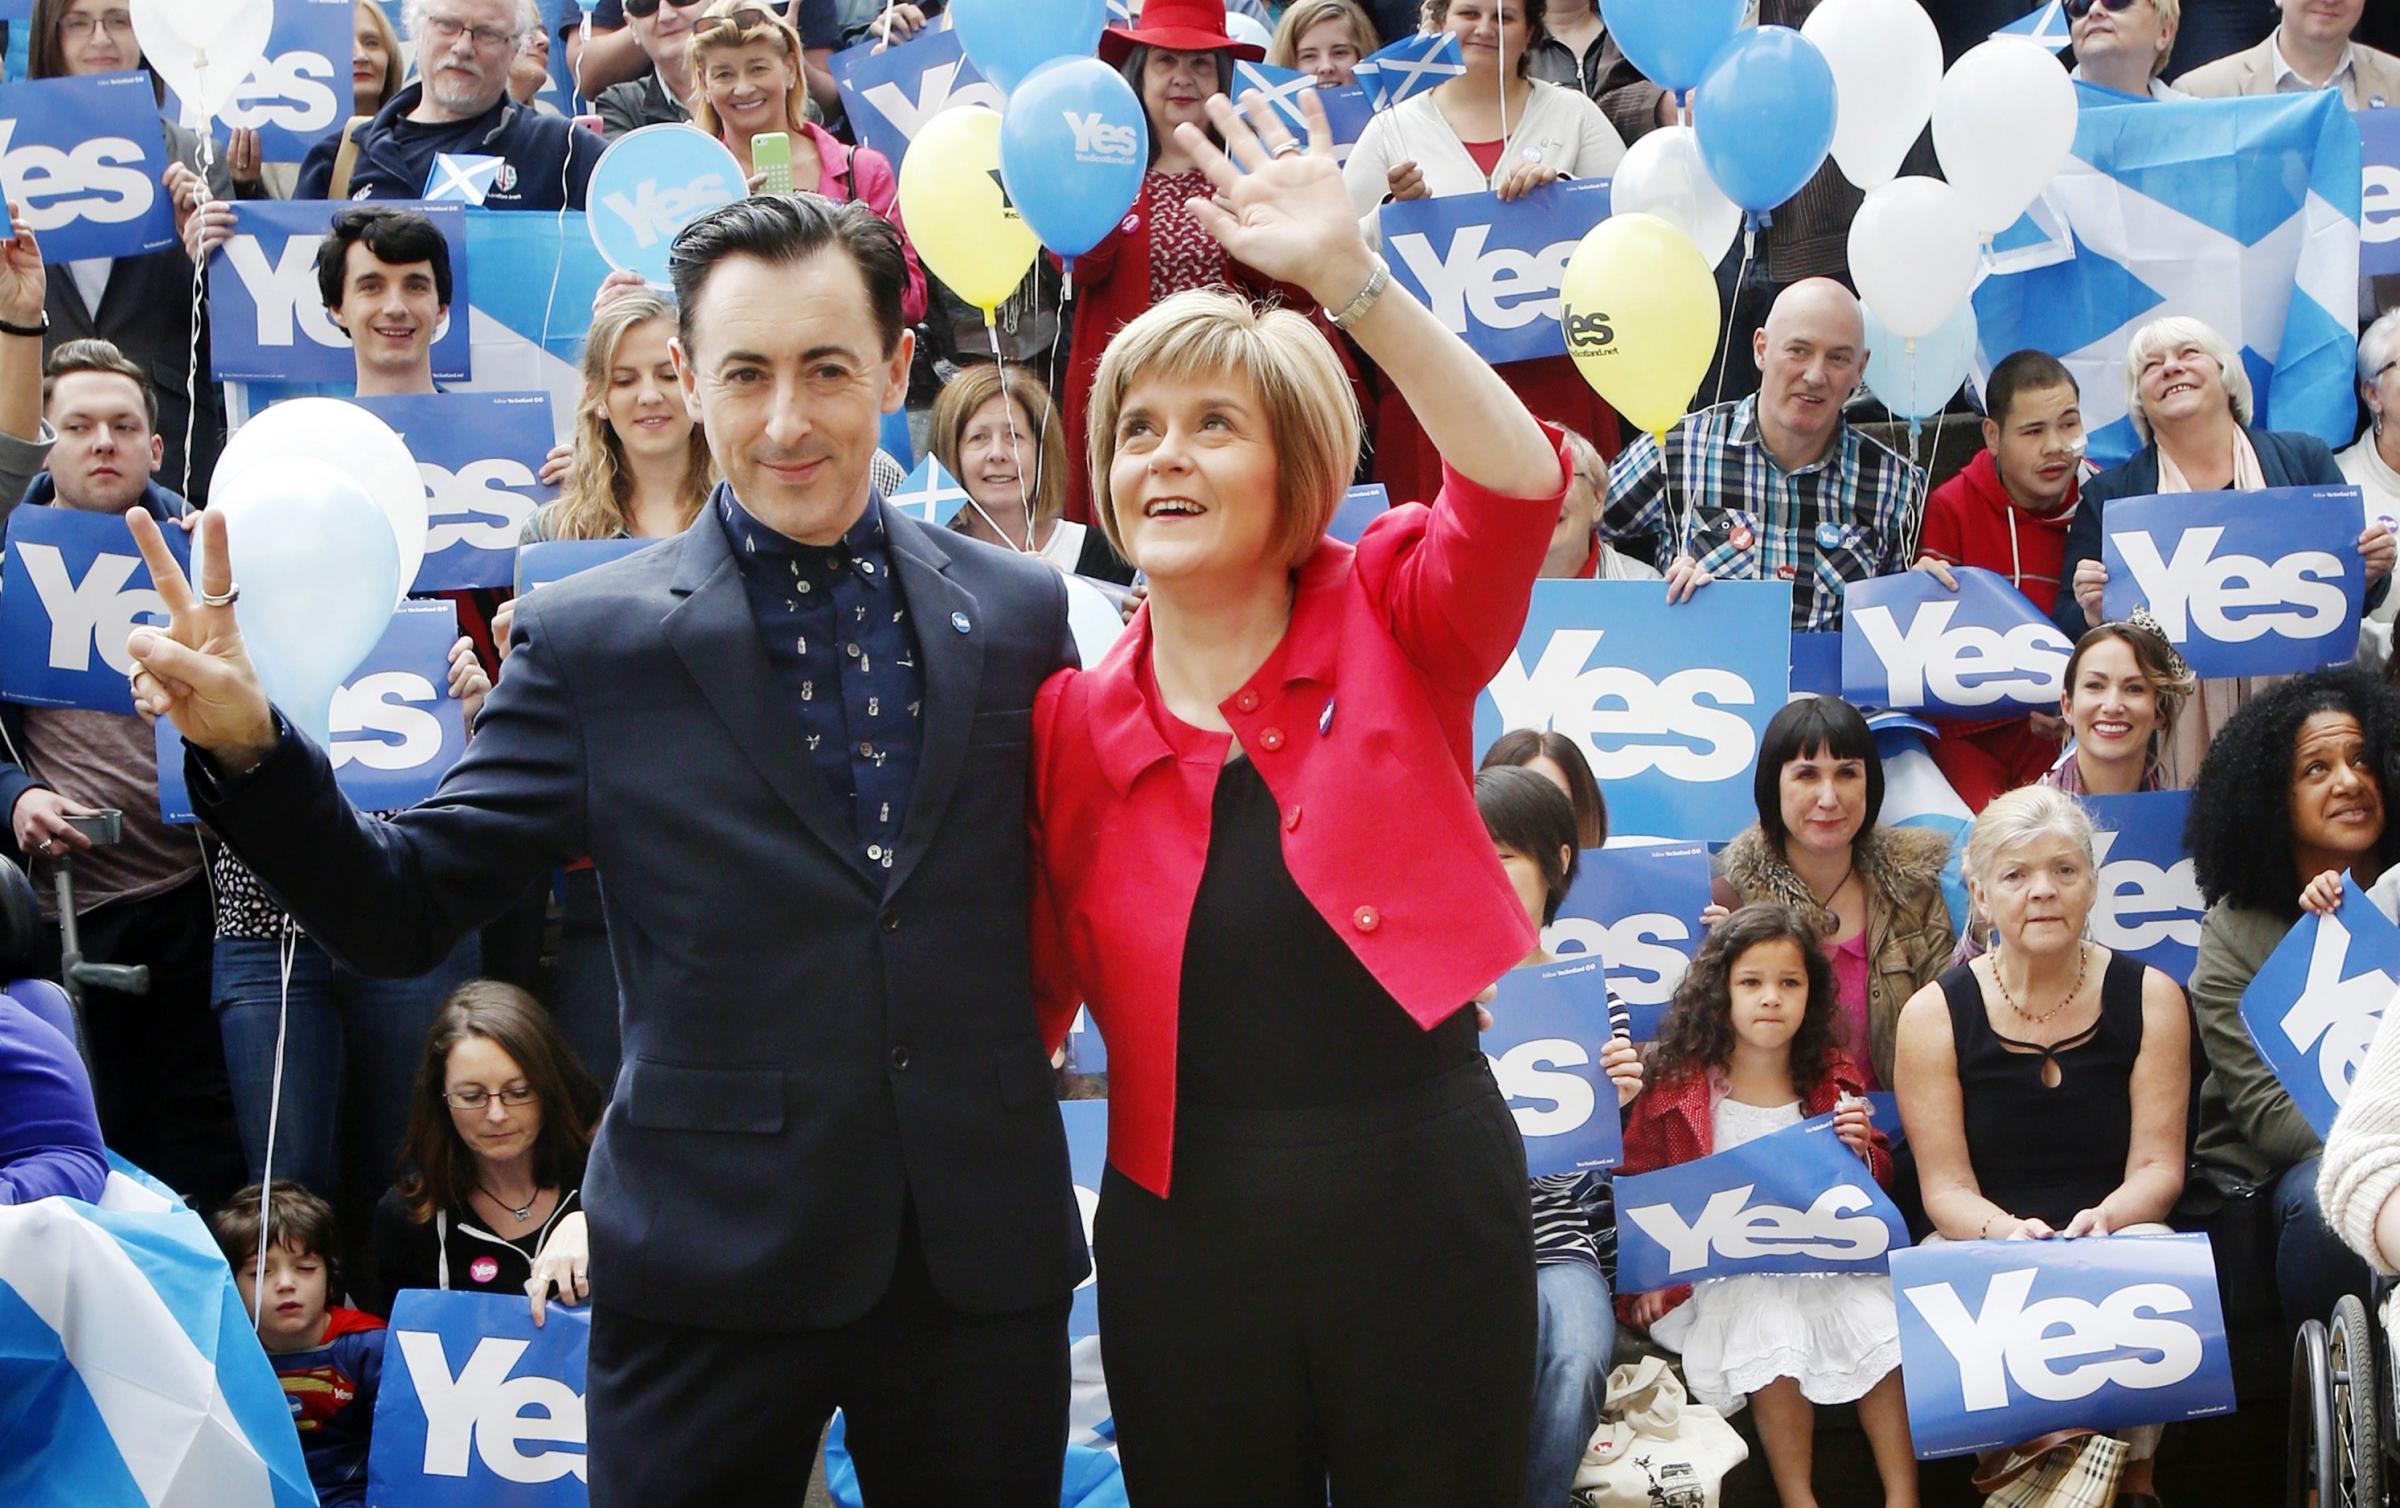 Alan Cumming: Scots were 'duped' in 2014